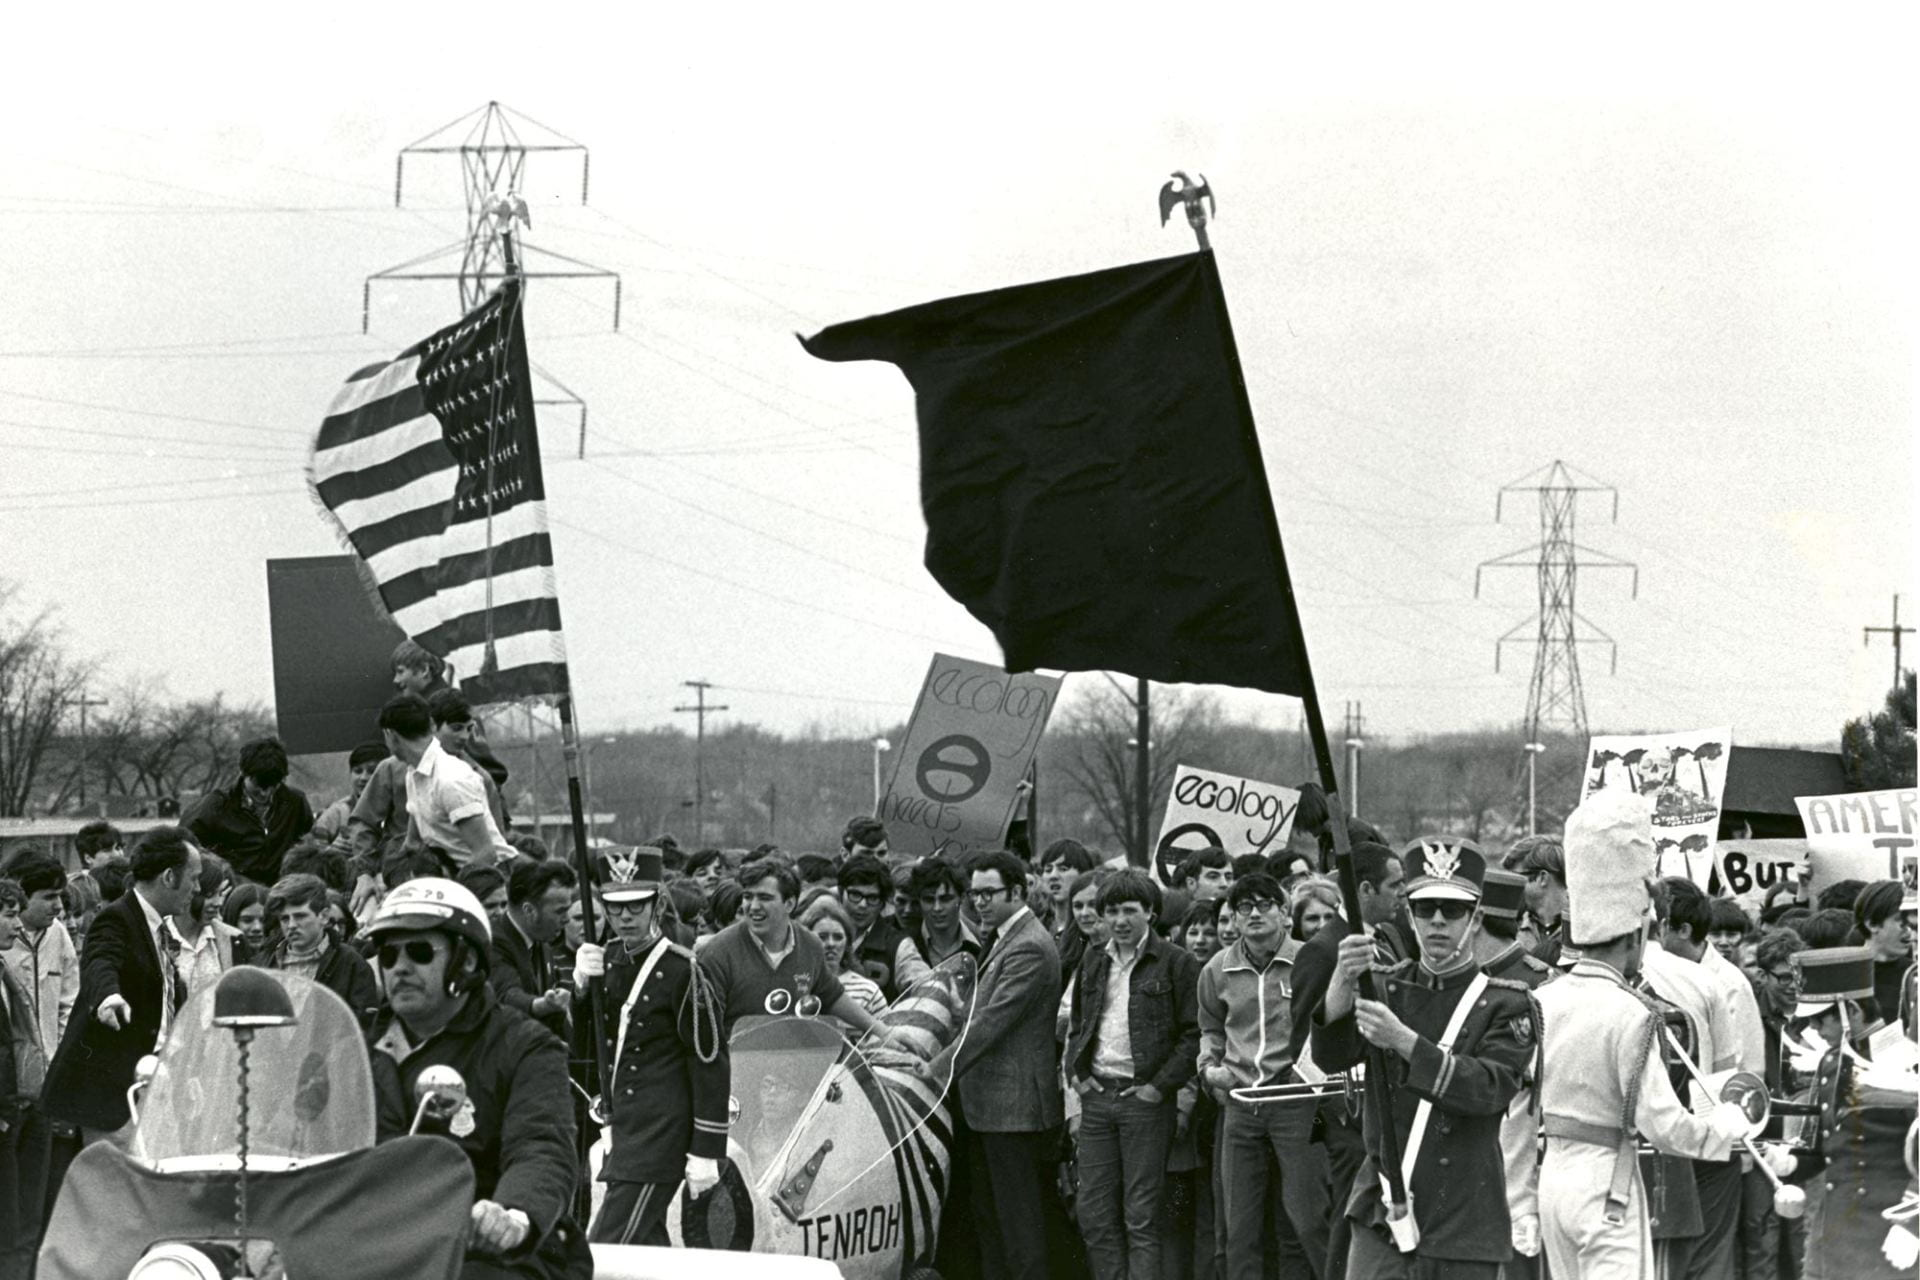 Vintage photo of an environmental awareness demonstration political activist ralley circa 1970.